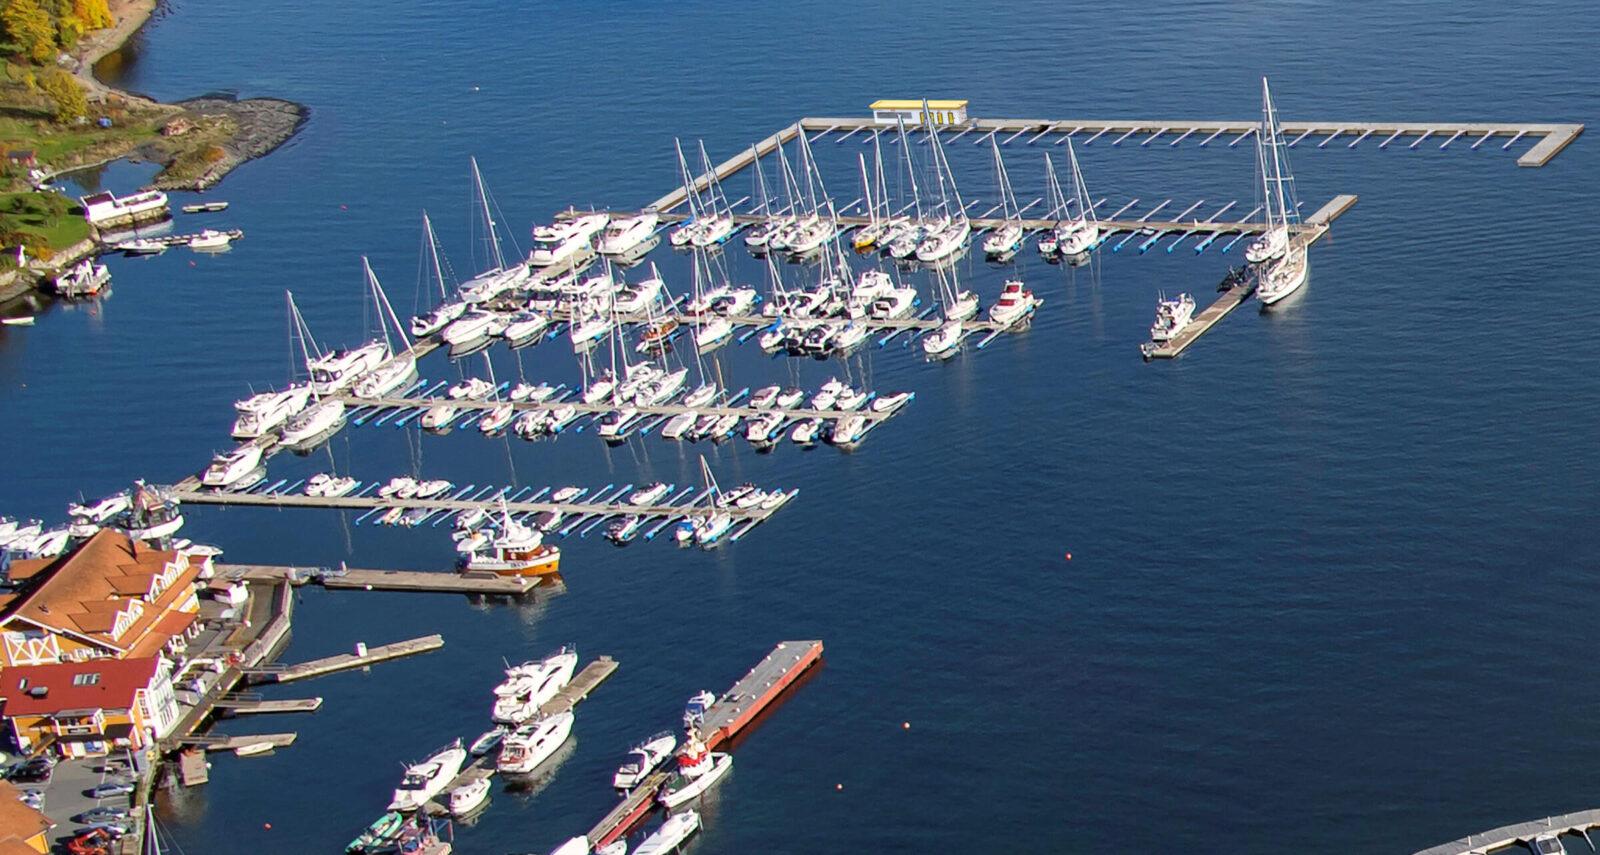 Vollen Marina flyfoto stort